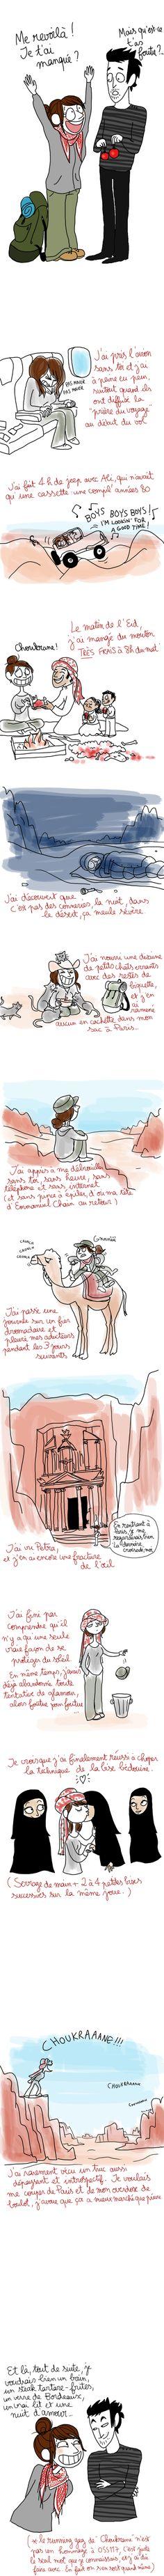 La petite Bédouine en Jordanie